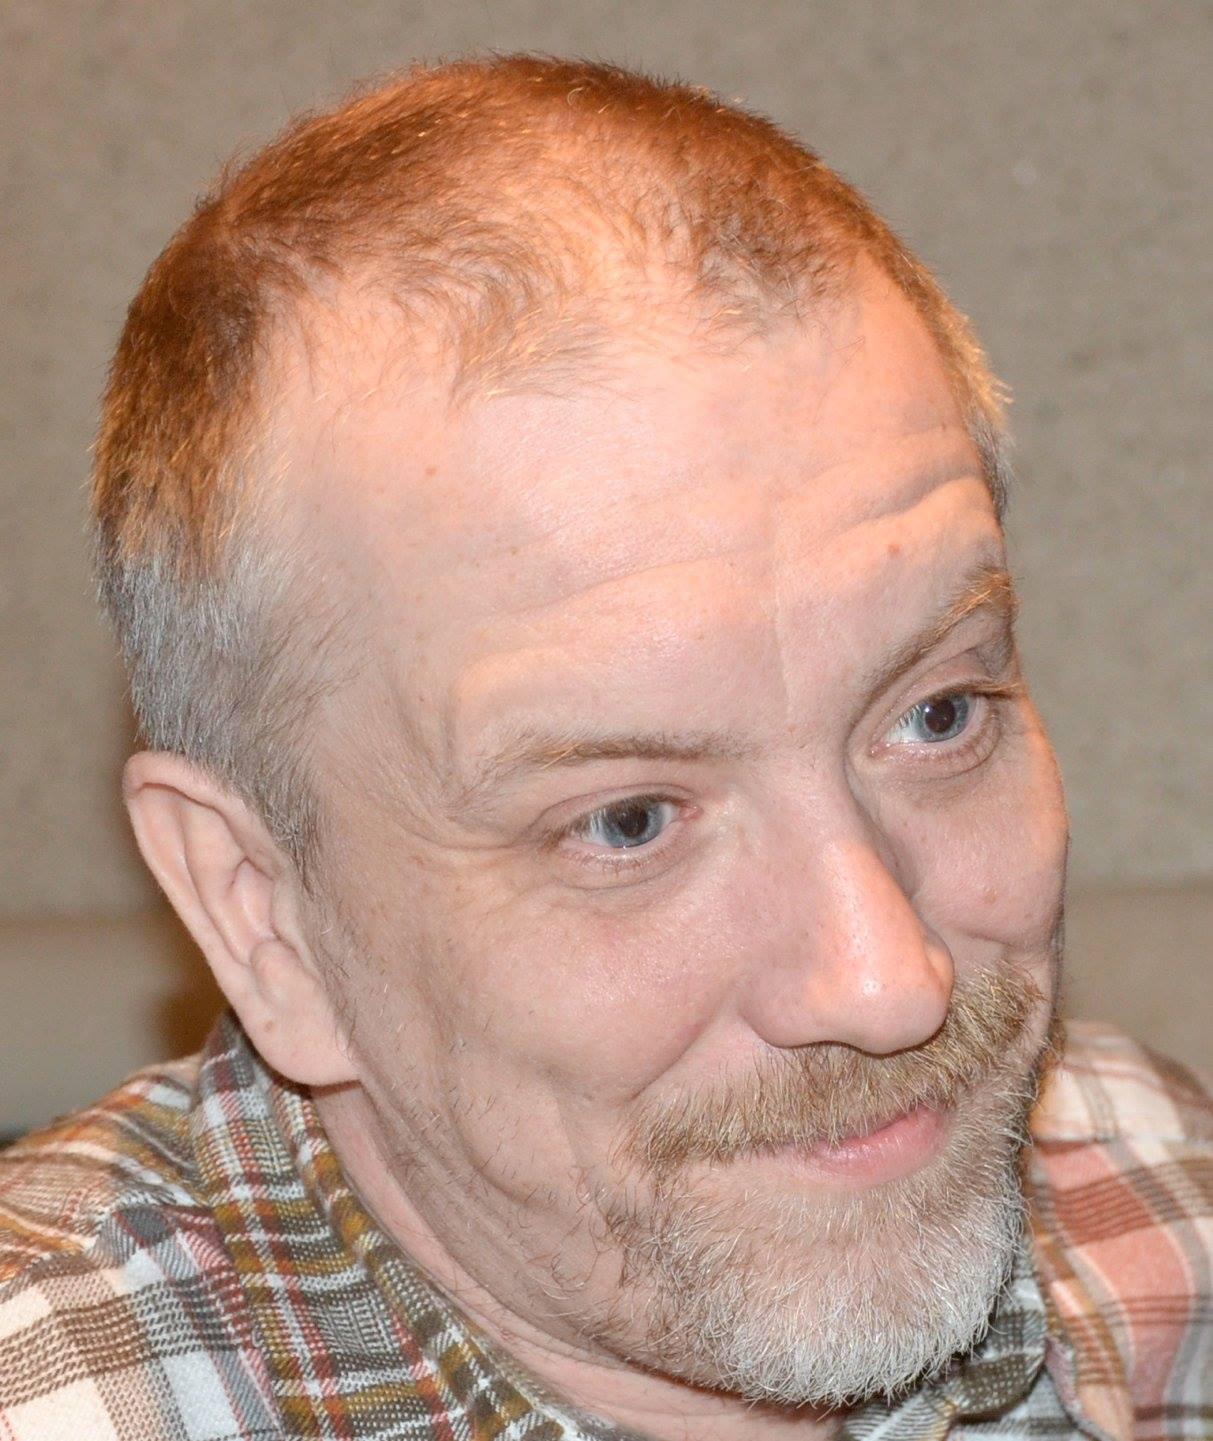 Martin Knepper